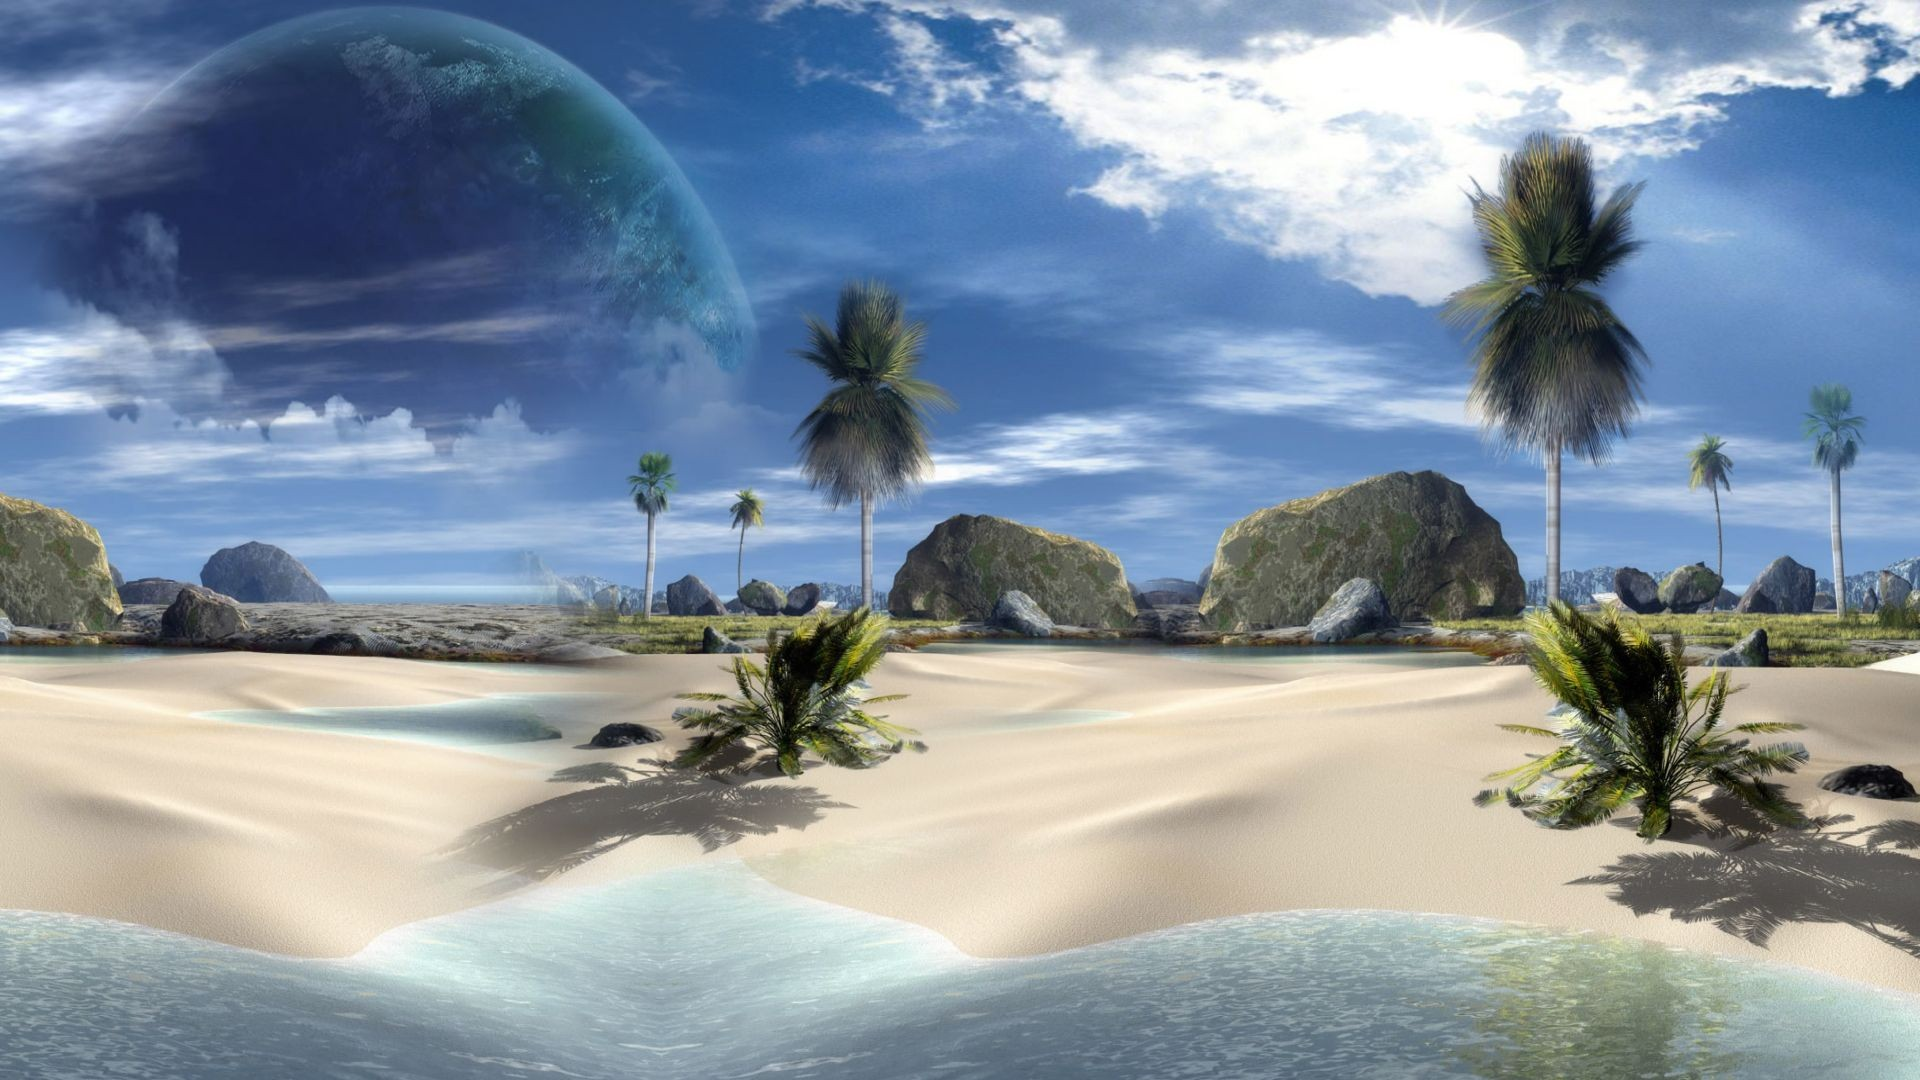 Hd Tropical Island Beach Paradise Wallpapers And Backgrounds: Wallpaper Landscapes Beach Tropical HD